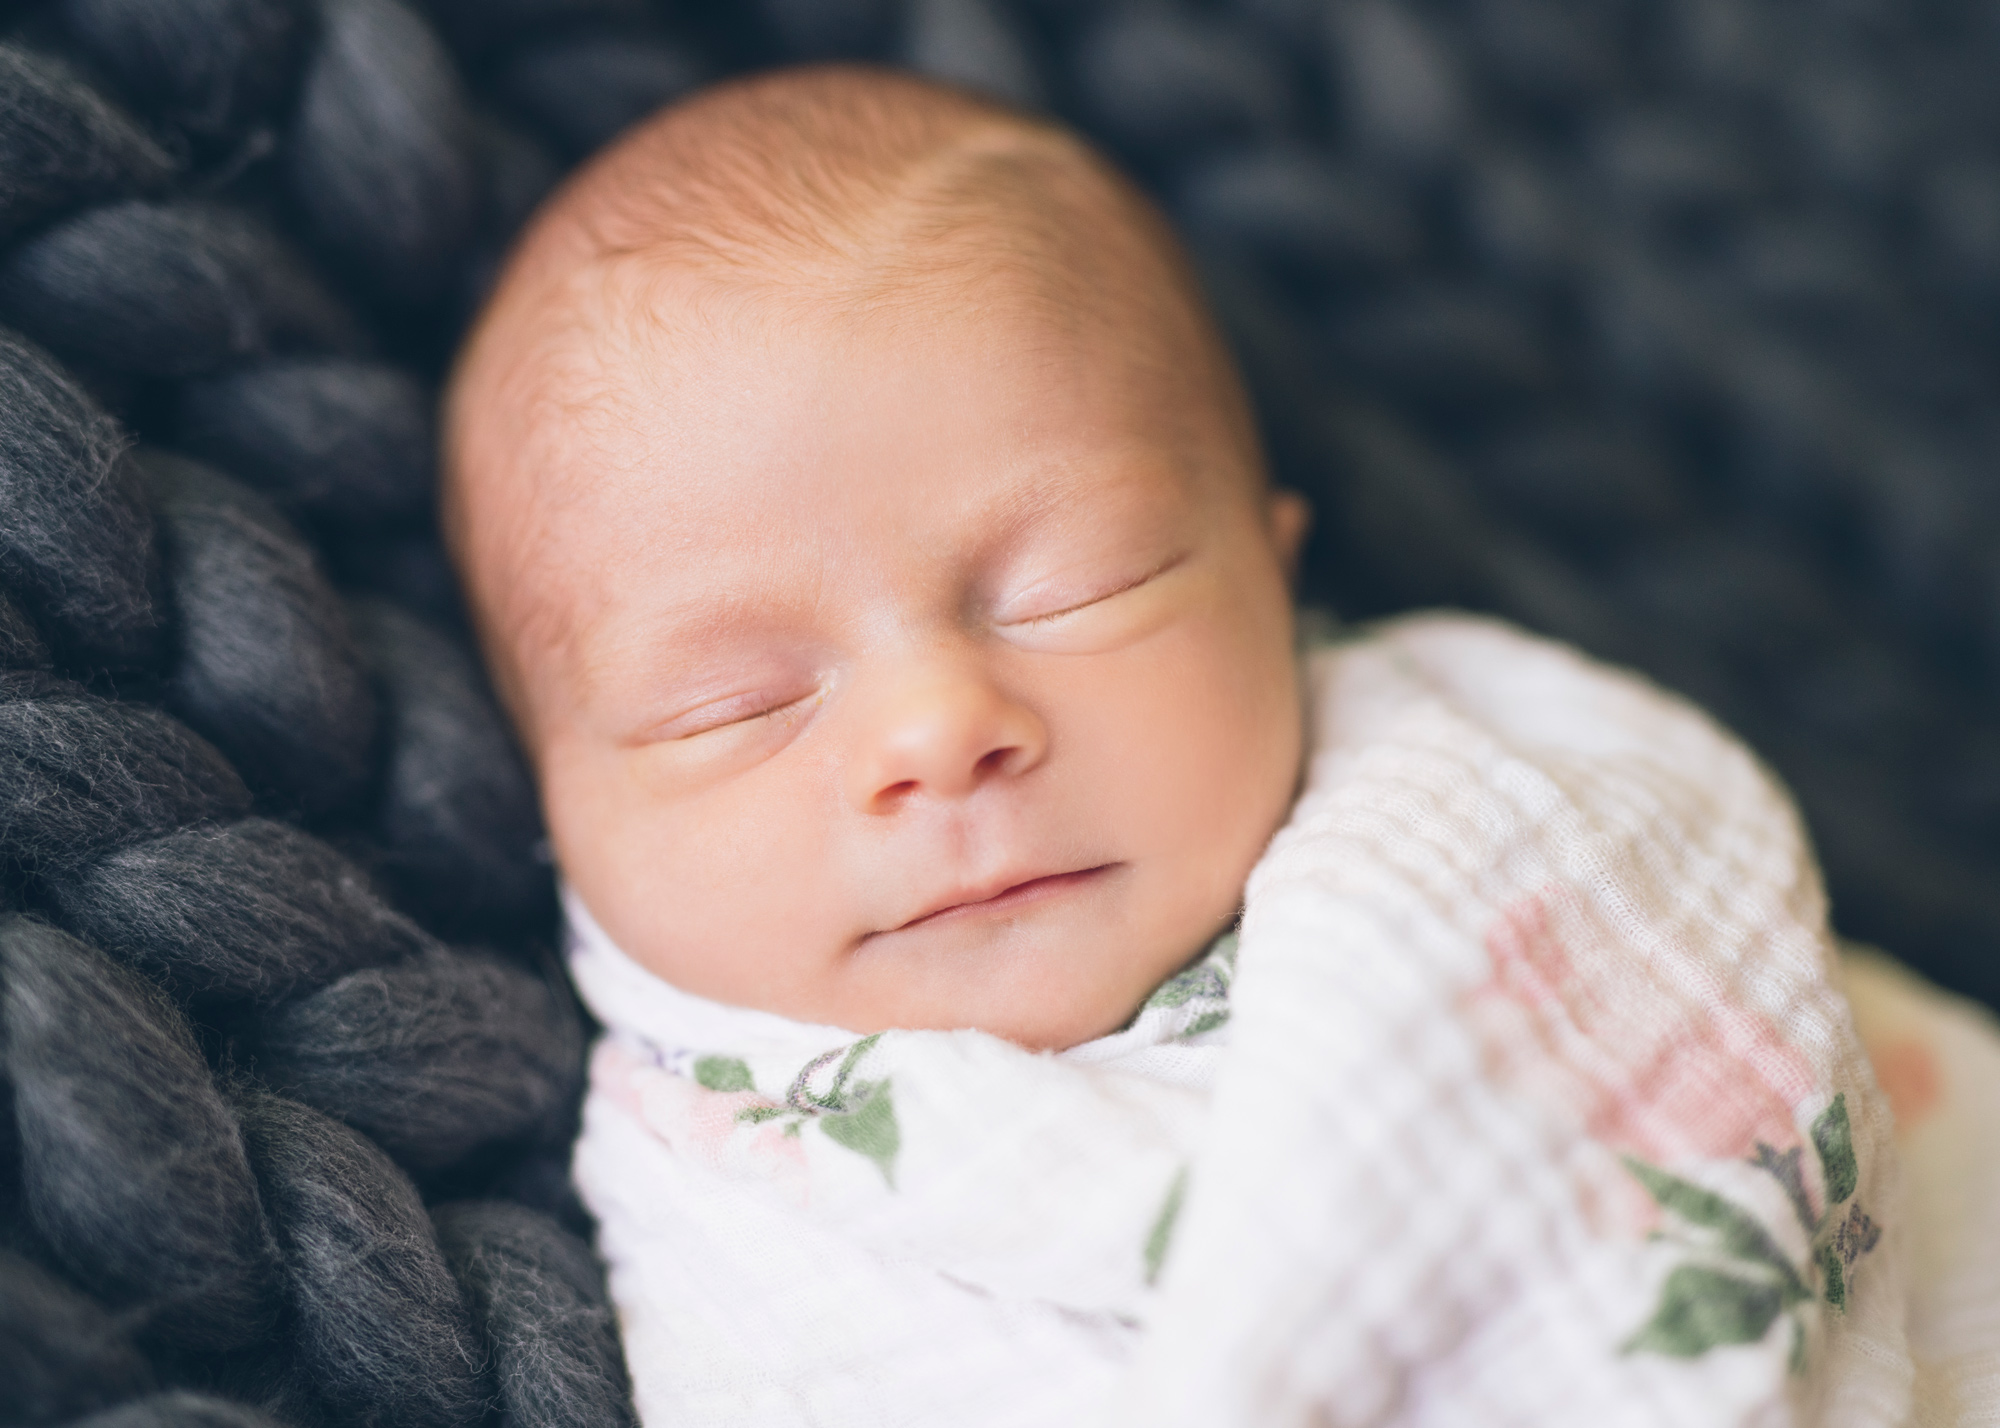 baby-girl-sleeping-on-a-chunky-grey-knit-blanket.jpg